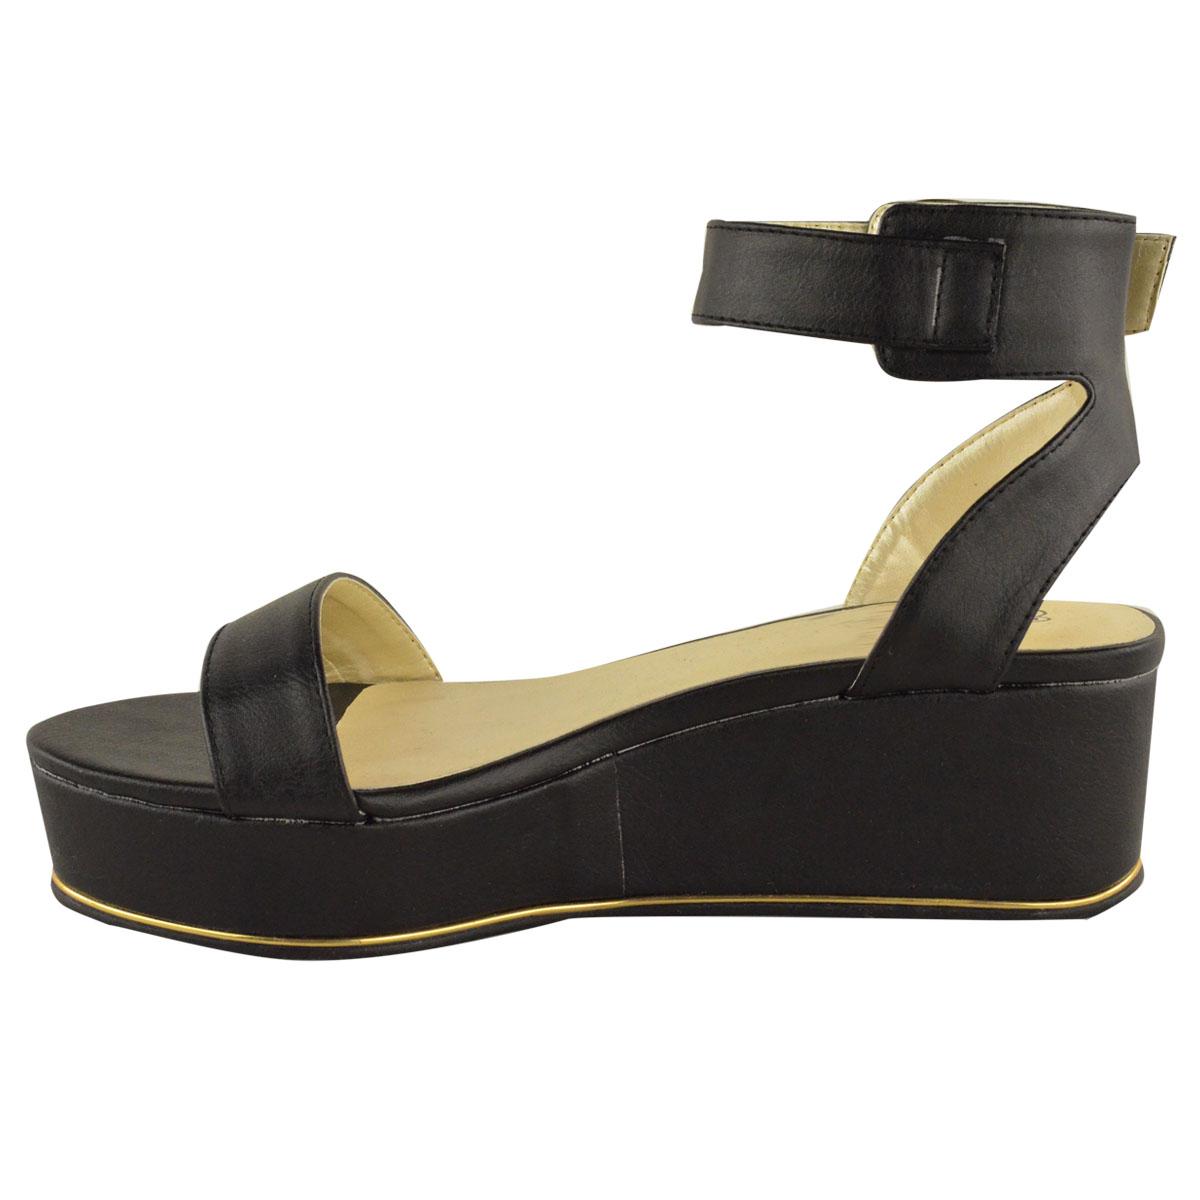 womens low wedge heel ankle summer sandals